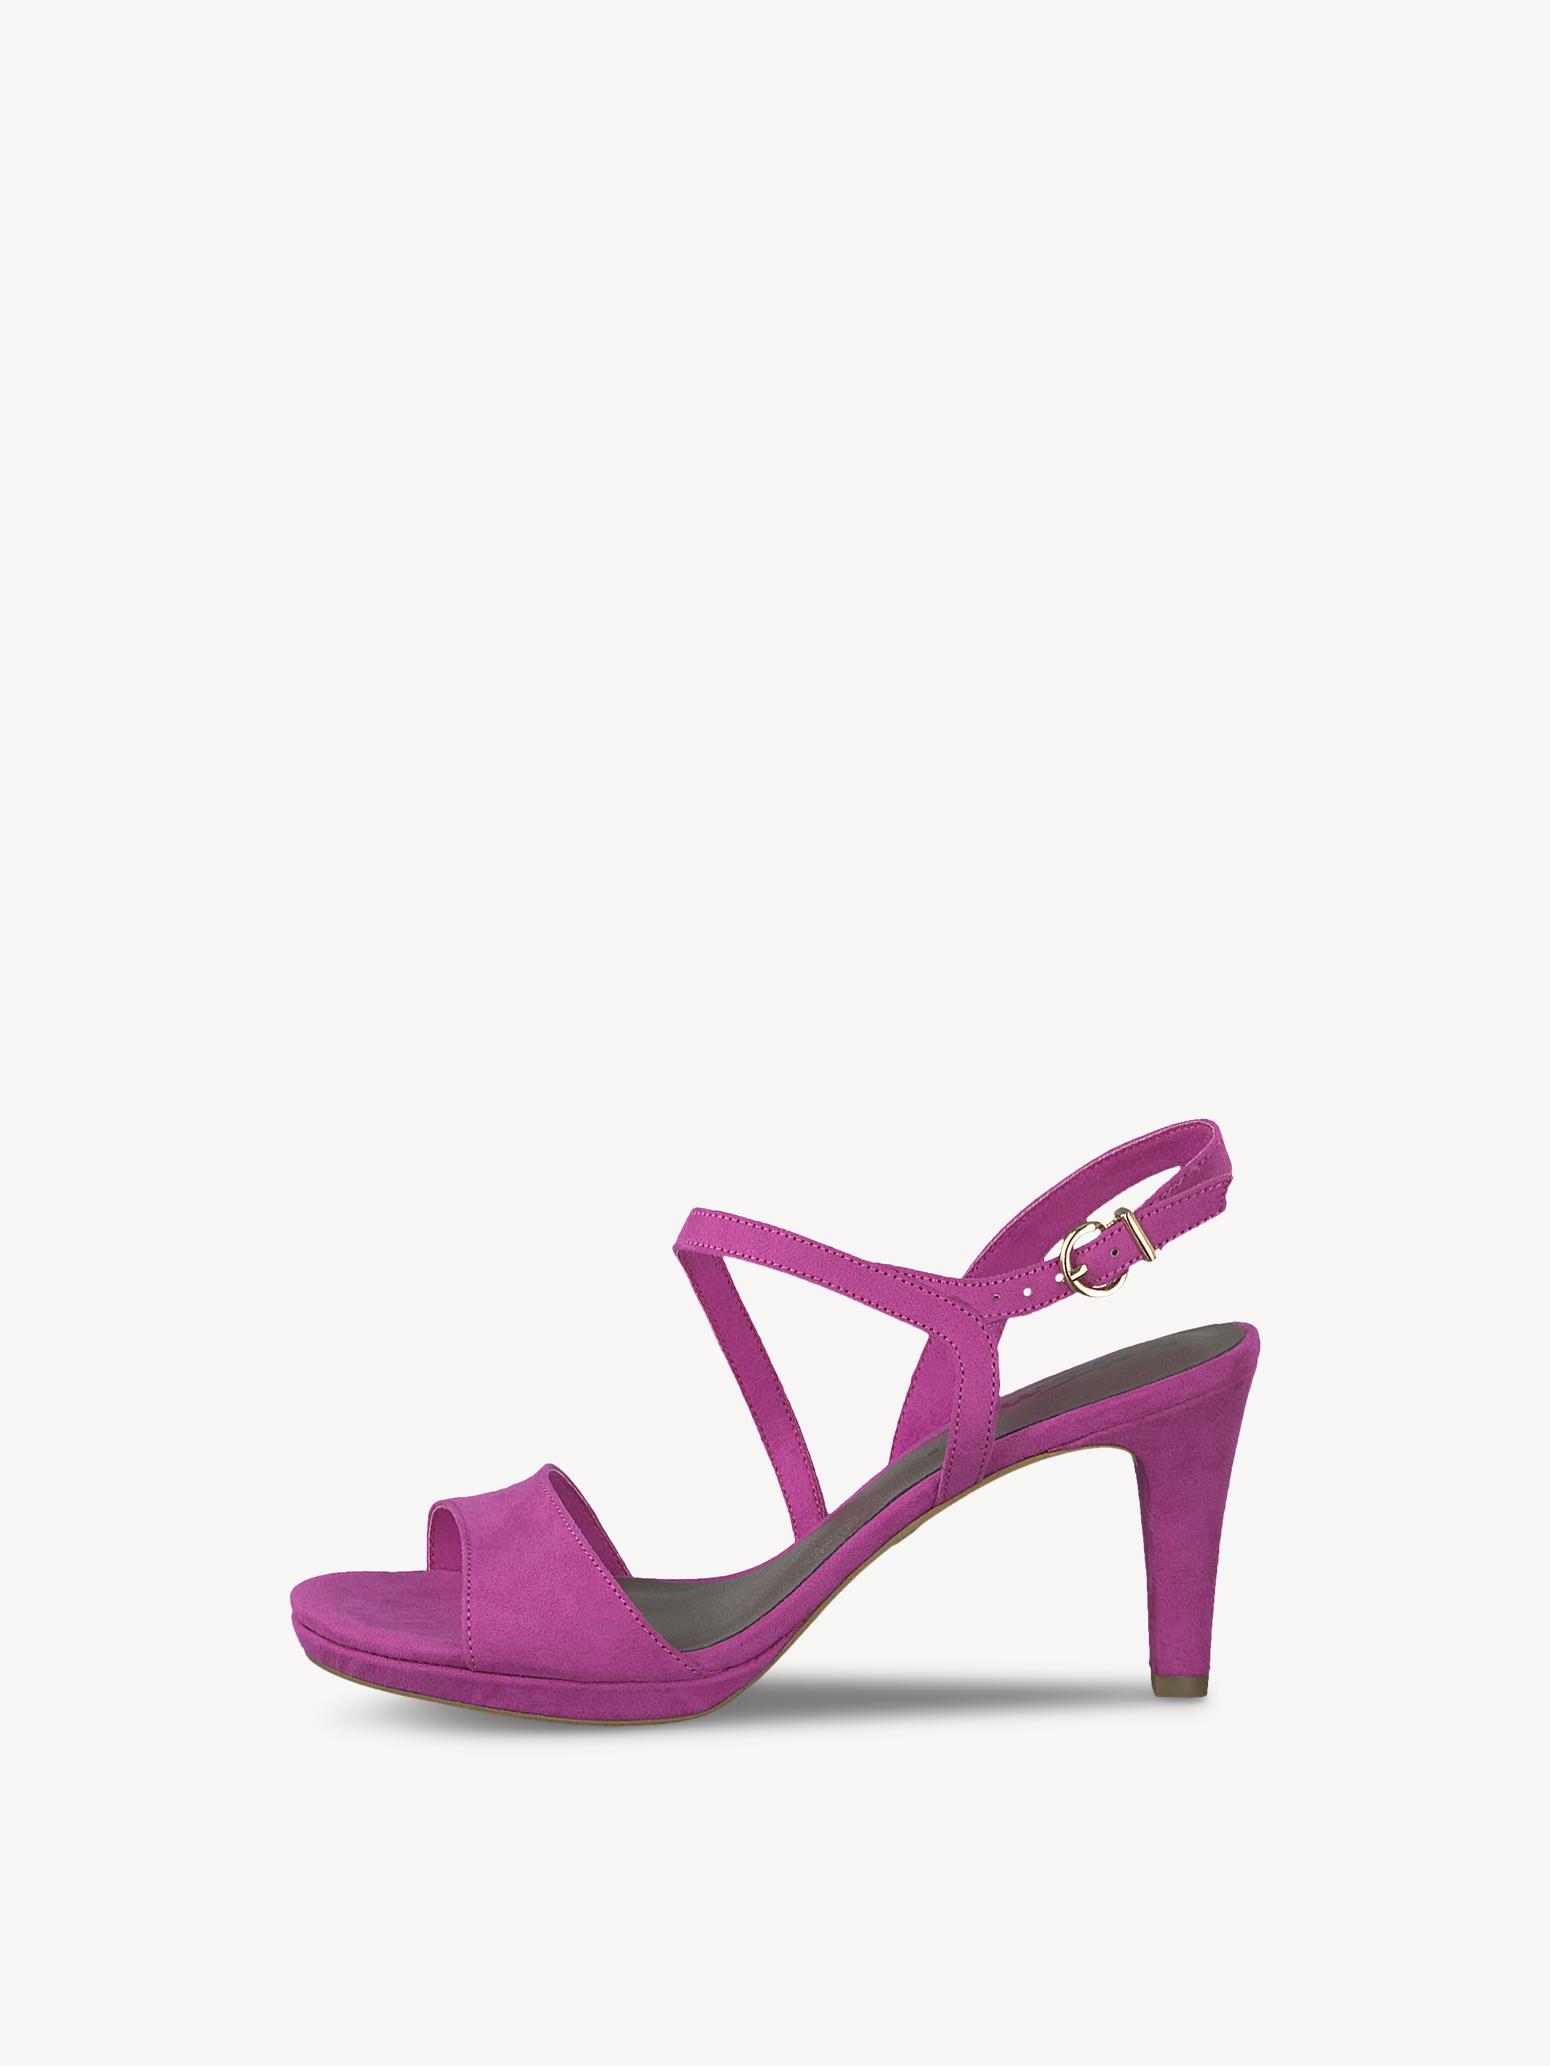 TAMARIS Sandale Sandalette Riemensandalette pink Gr. 41